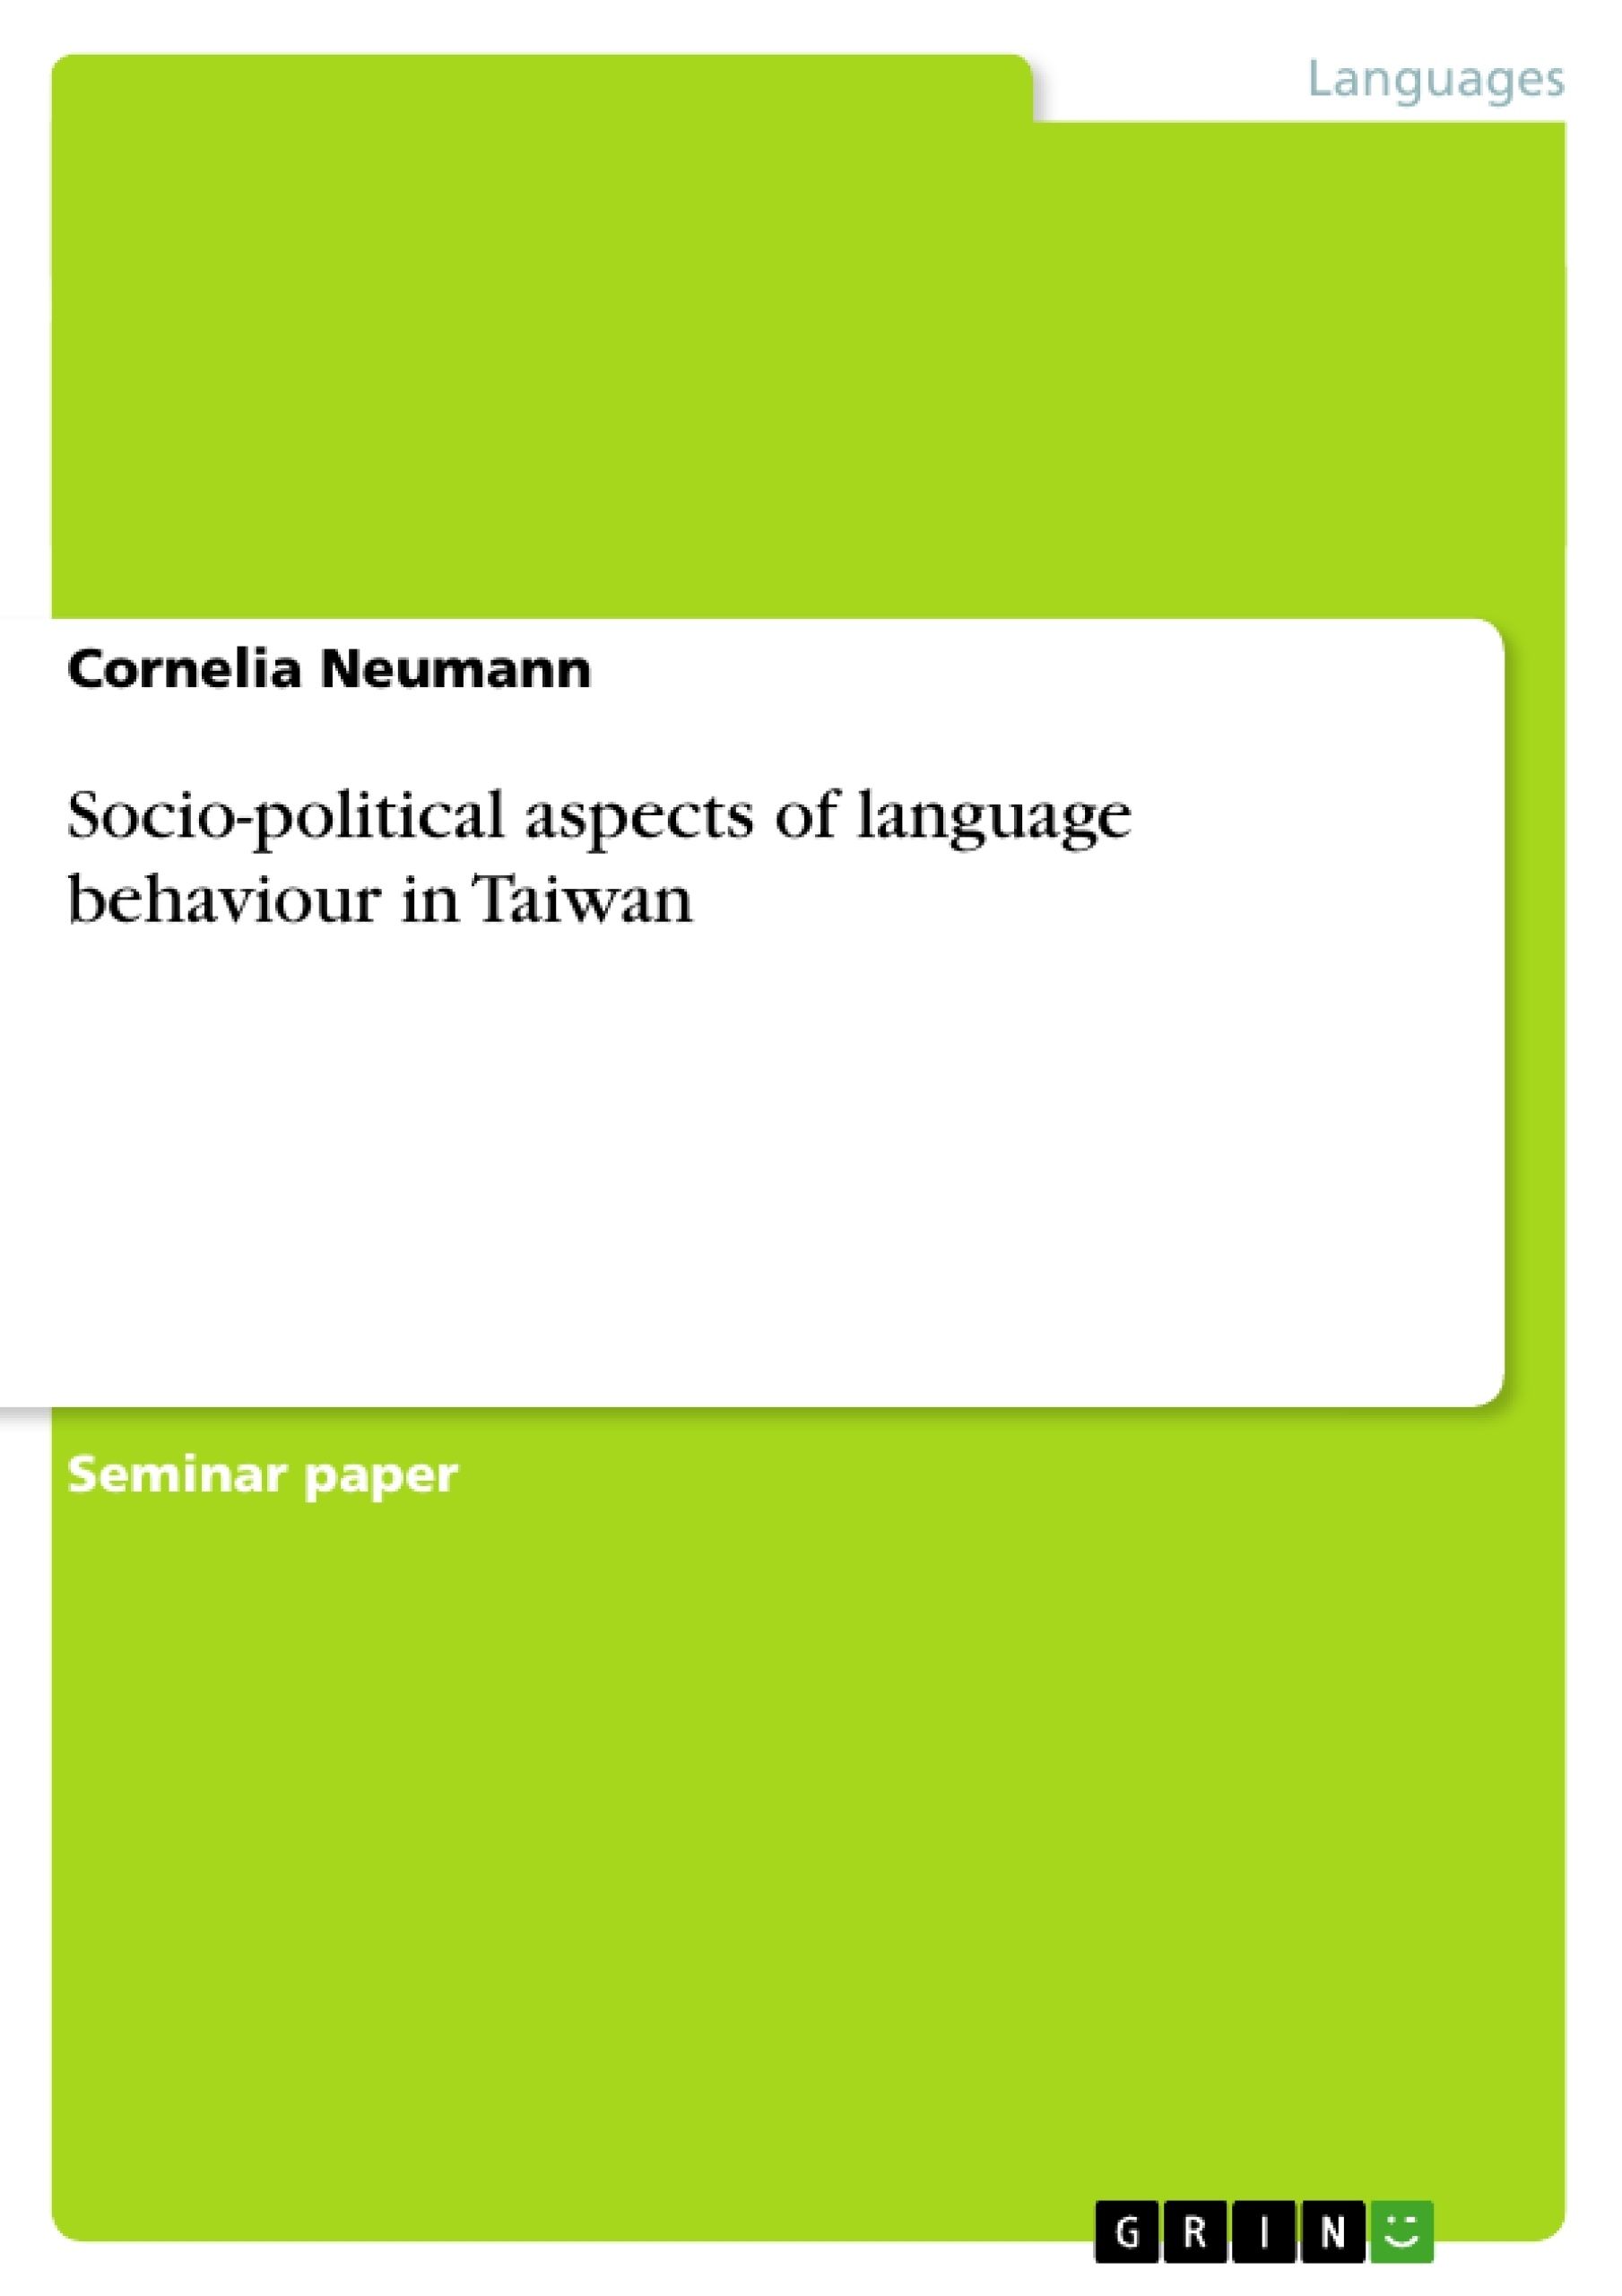 Title: Socio-political aspects of language behaviour in Taiwan